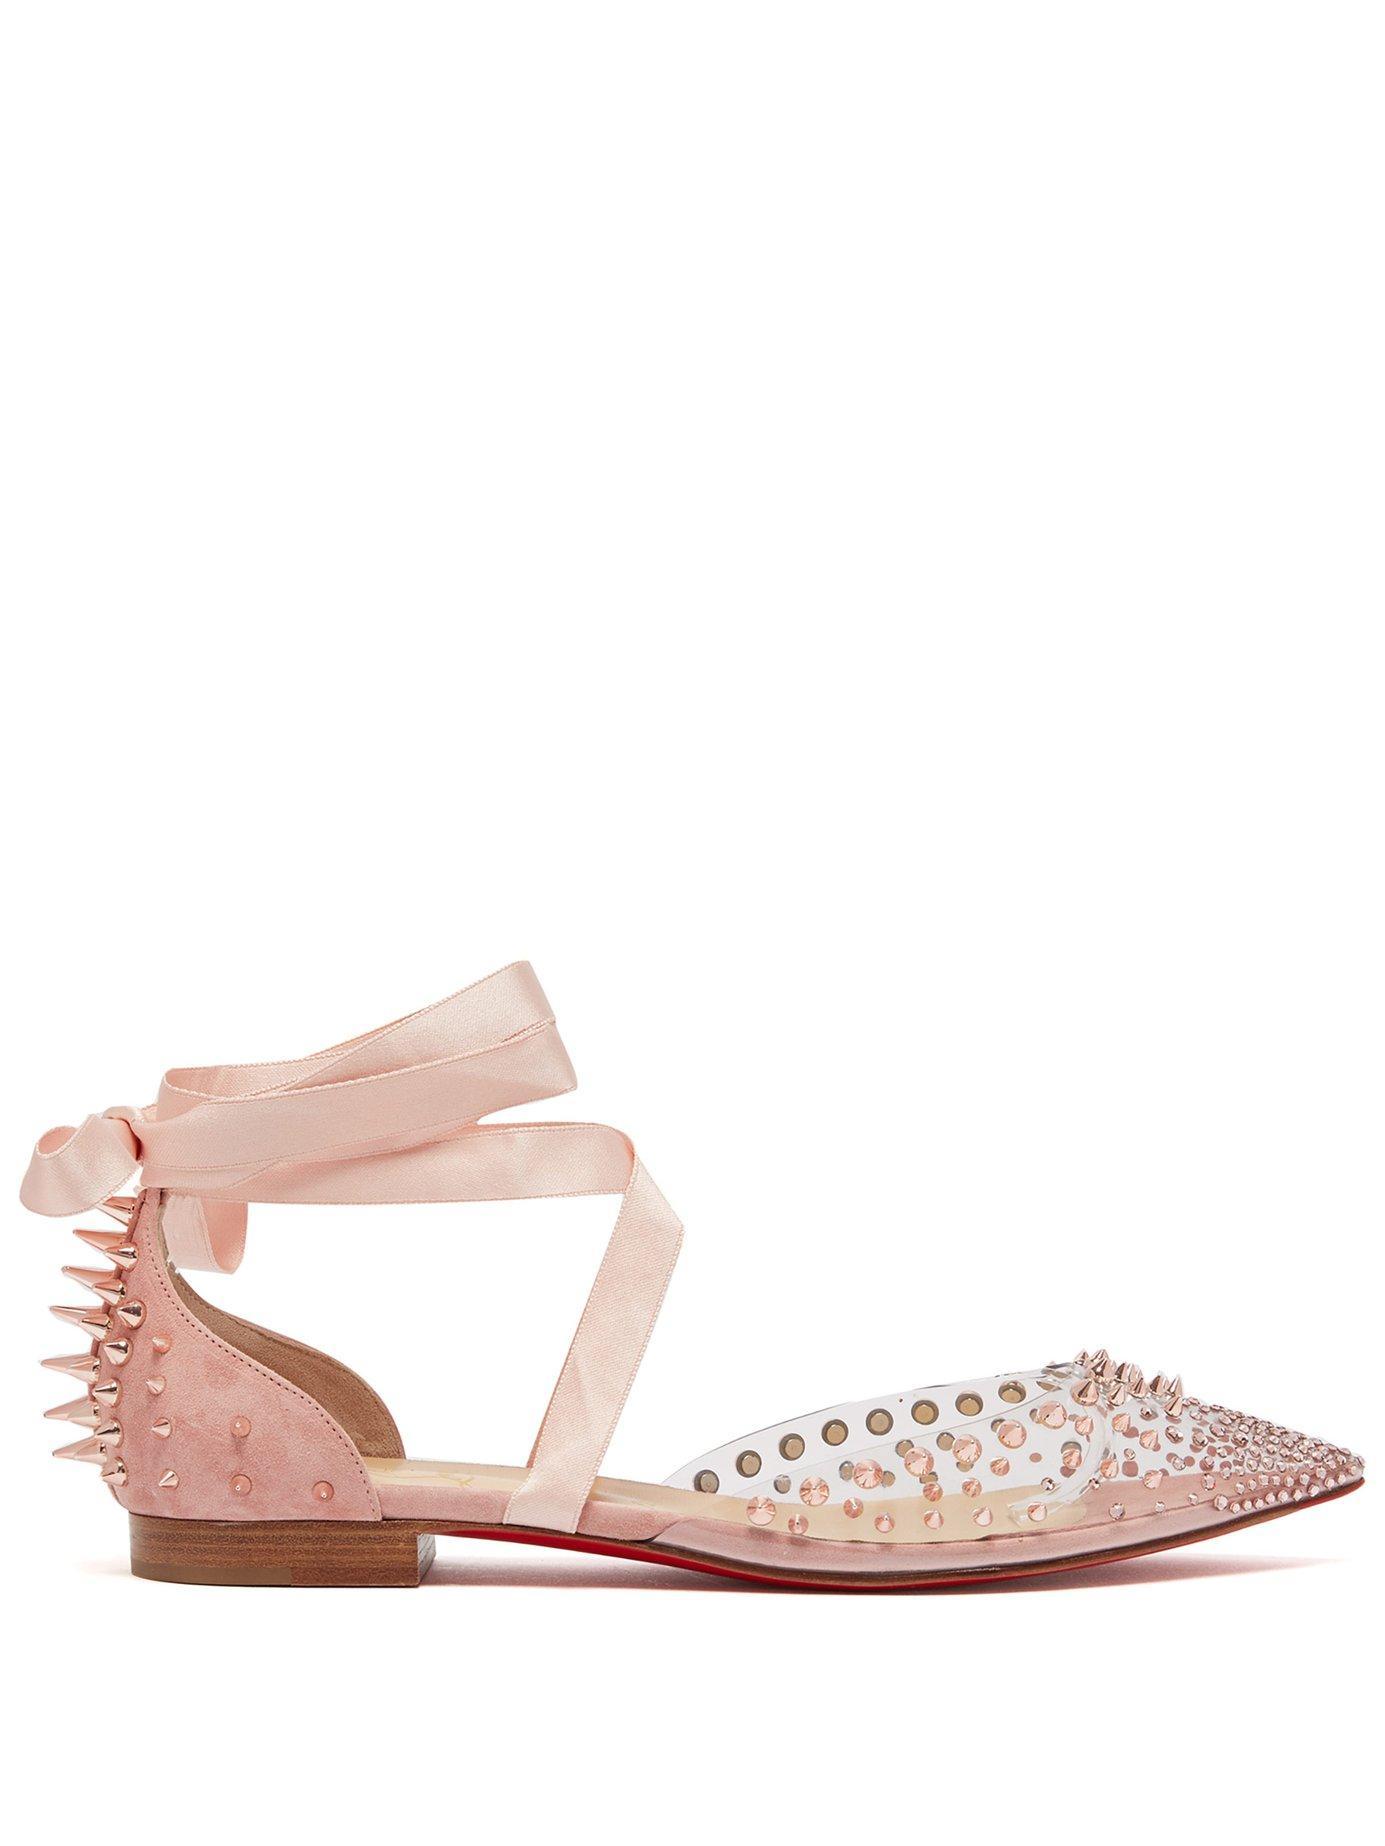 Mechante Reine Crystal And Stud Embellished Flats In Pink